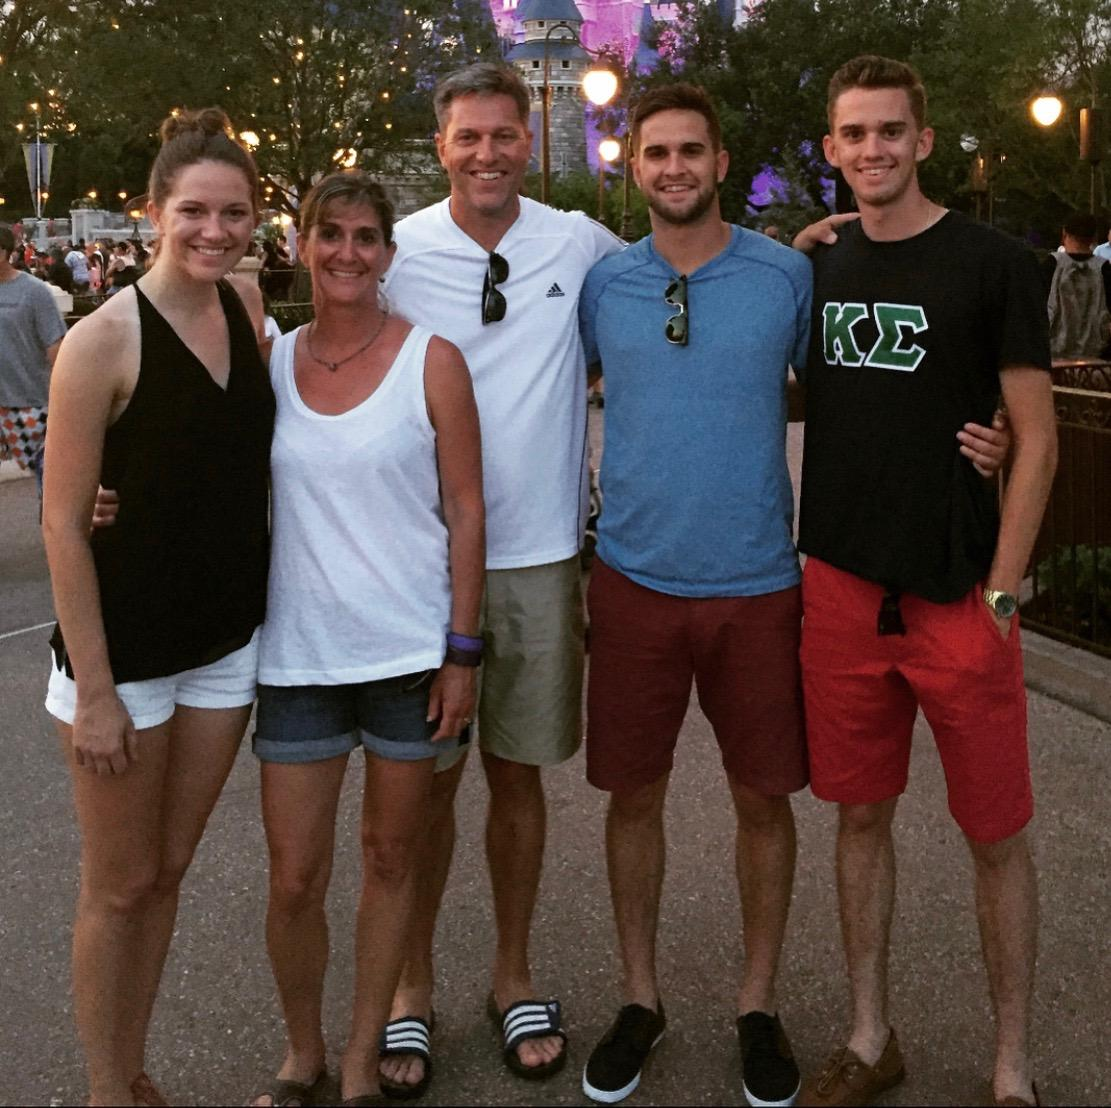 The Foreman Family! Left to Right: Amanda, Paula, Jim, Scott, and David